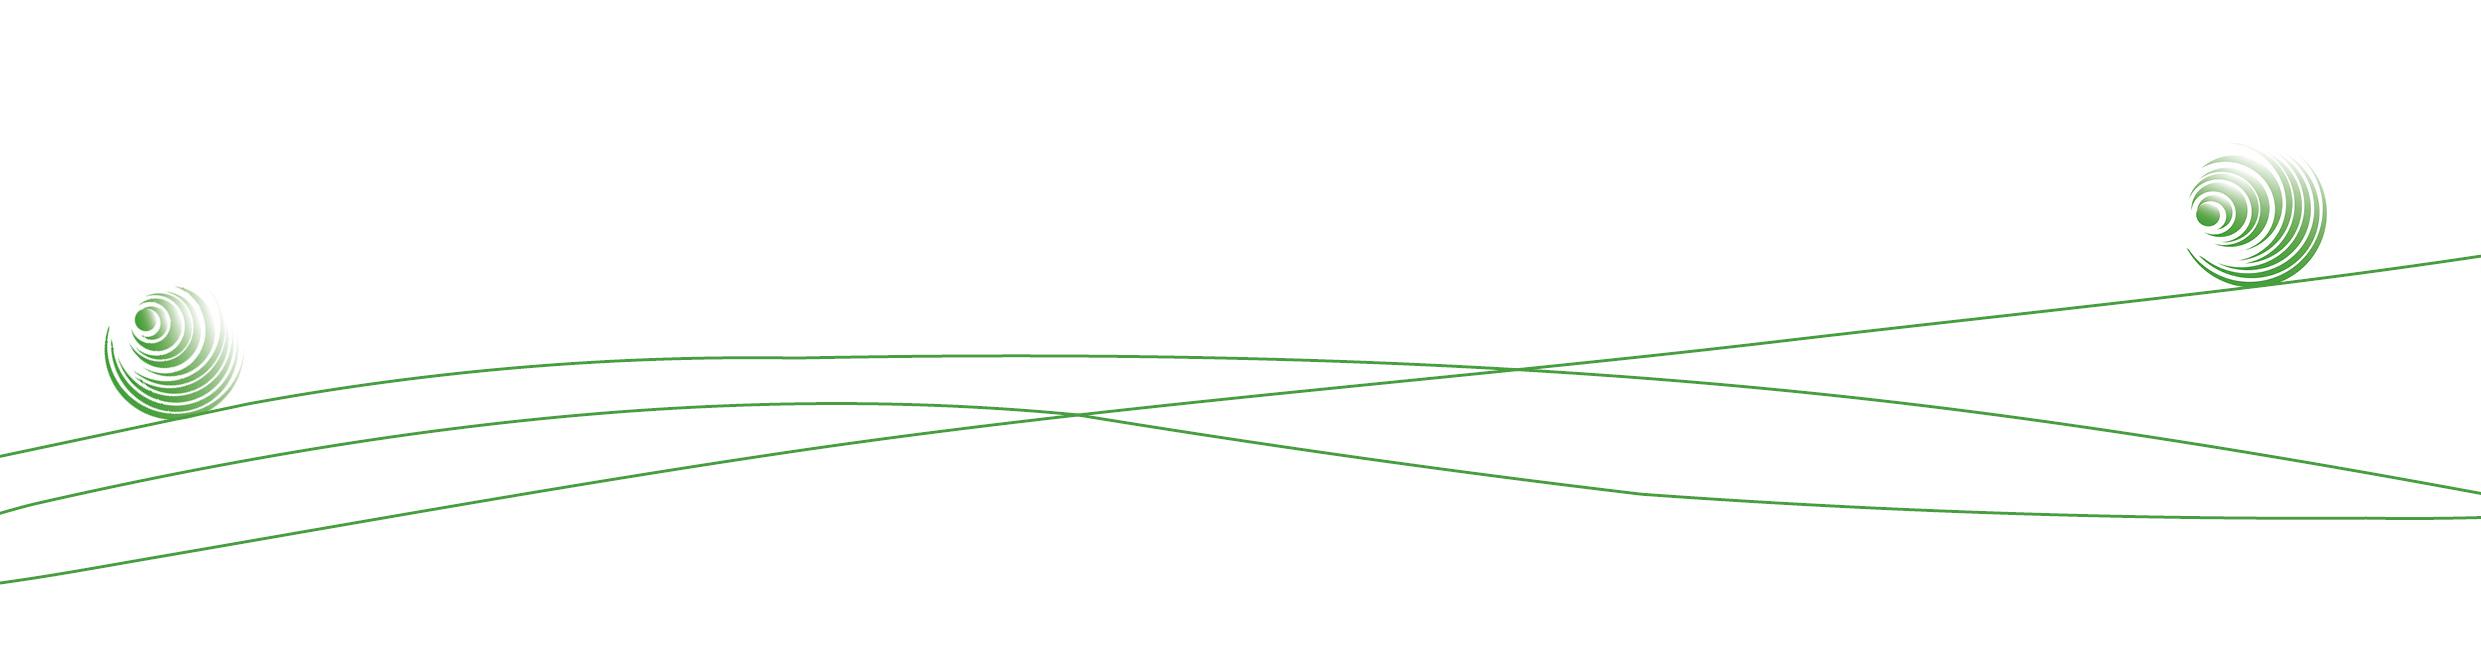 Sipralen und Linien im Fluss Physiotherapie Praxis Spuersinn Berlin